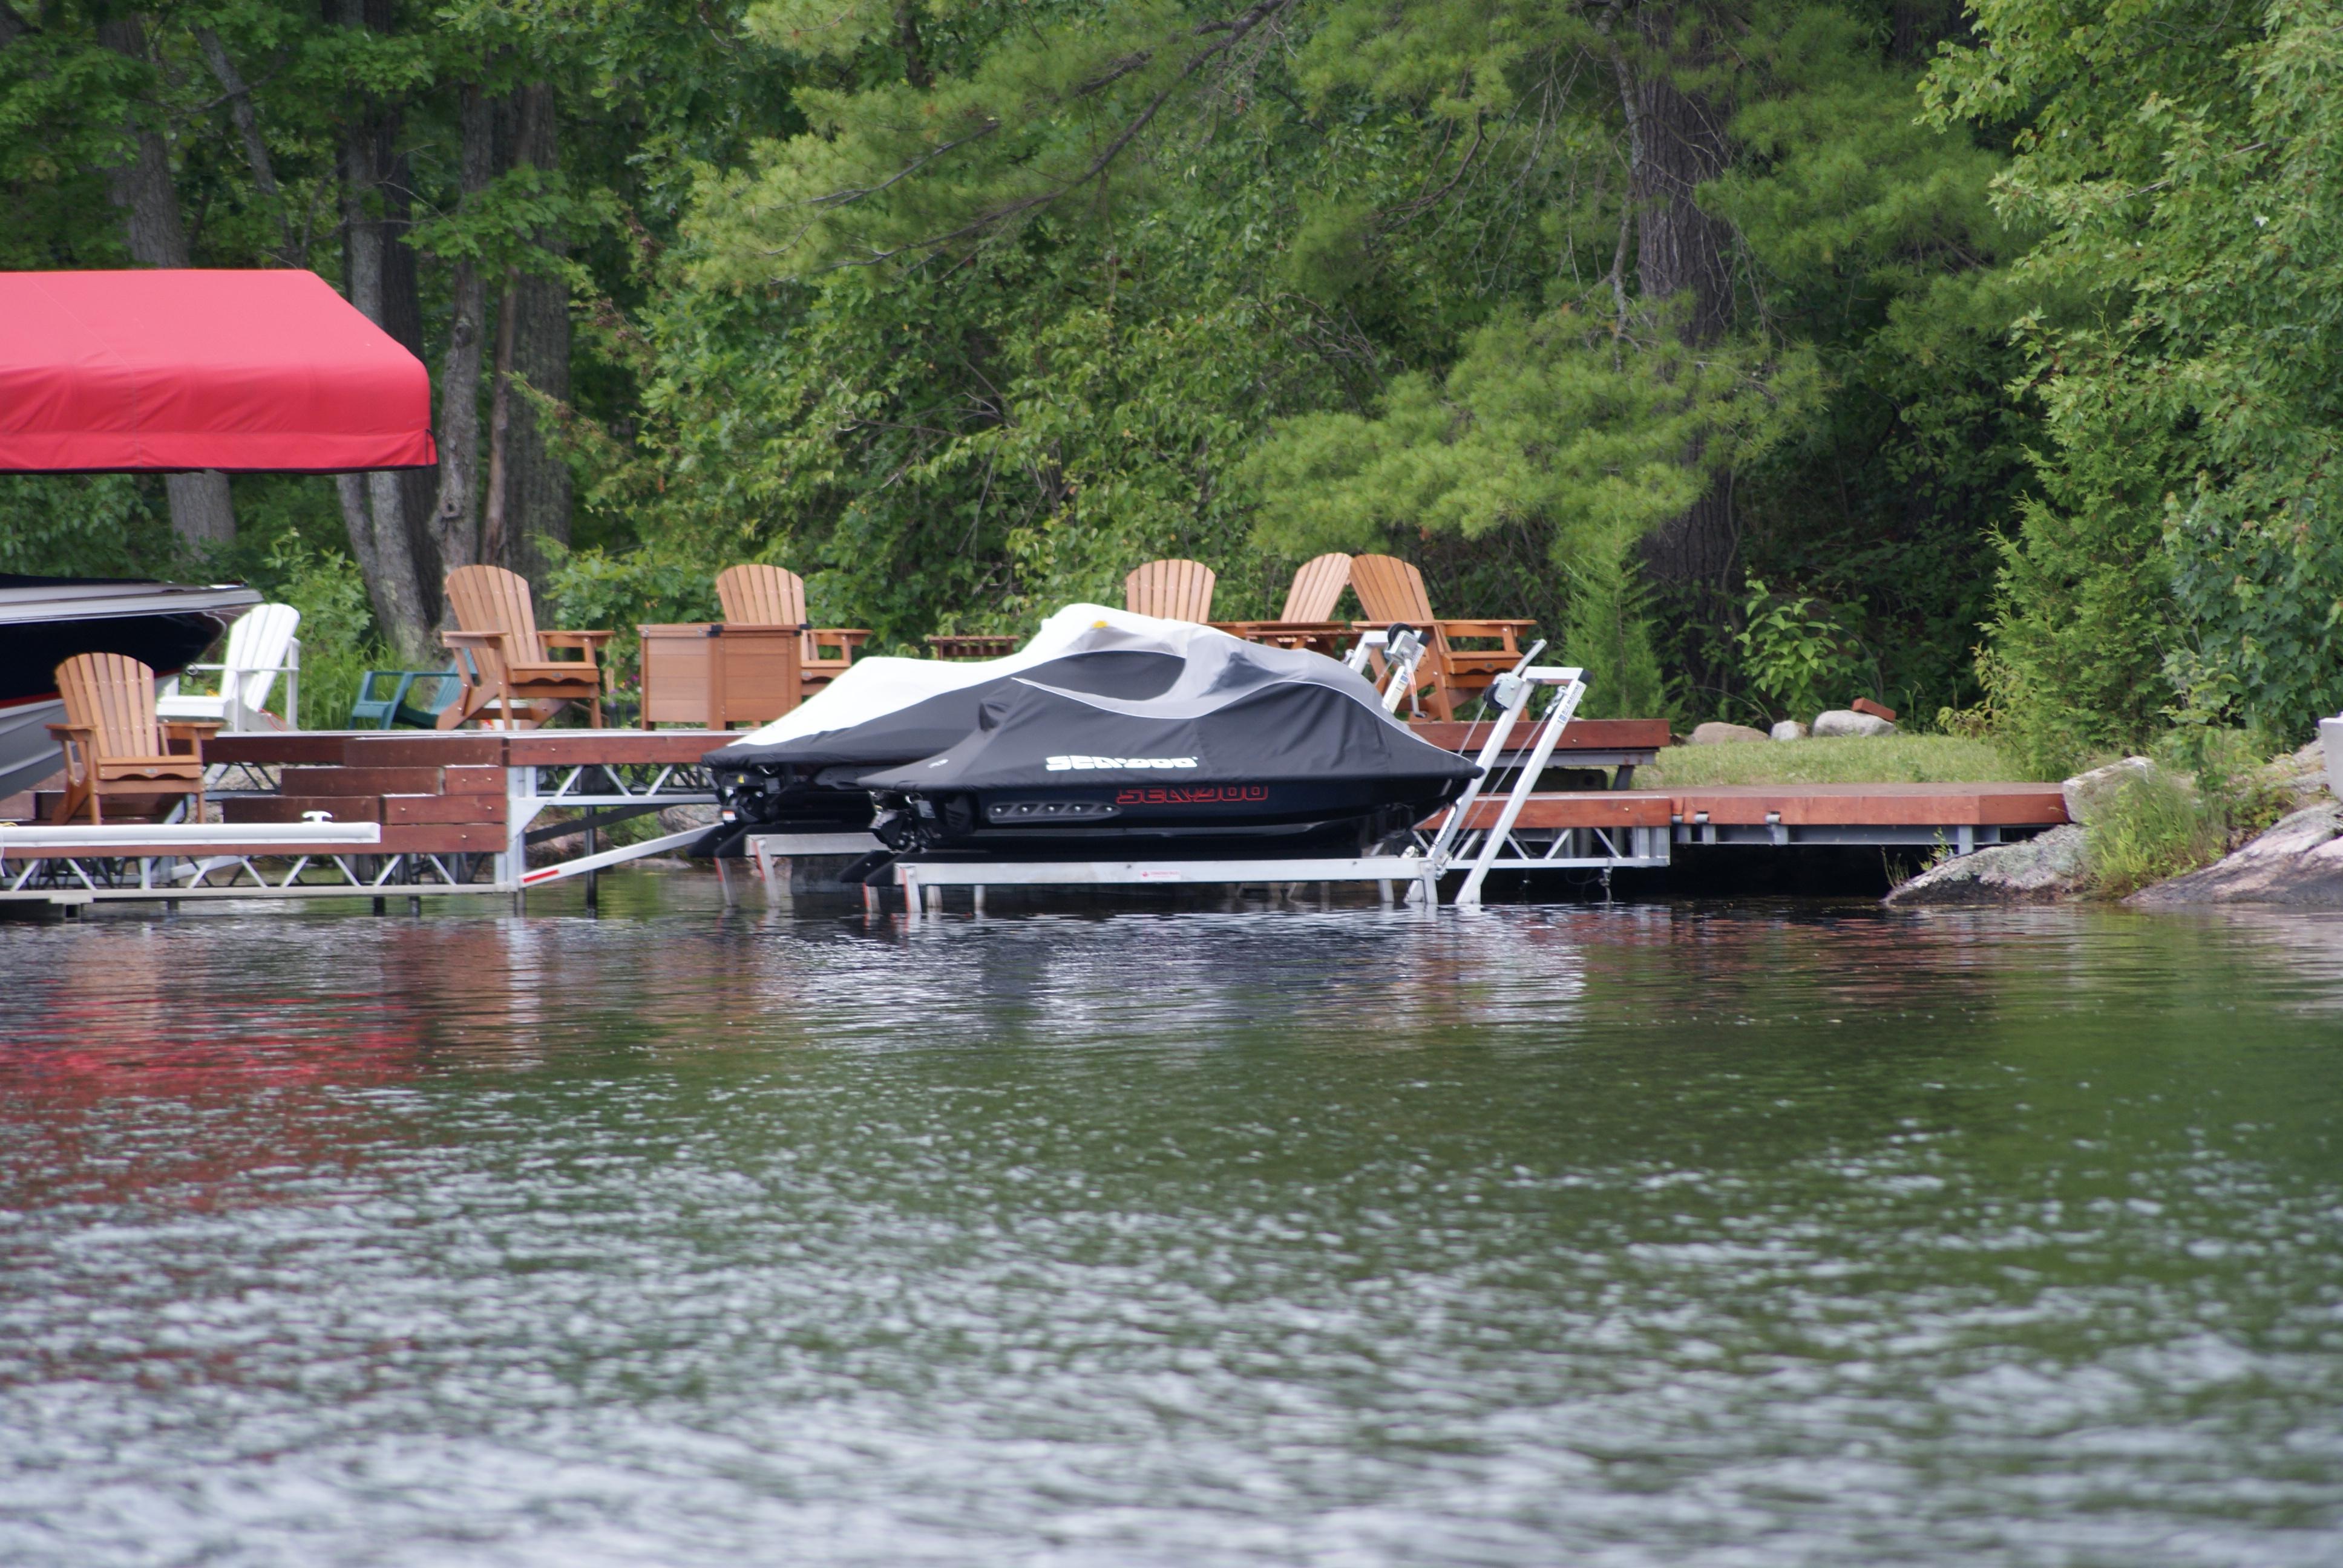 Personal Watercraft Lifts | Sea-Doo Lifts – R & J Machine